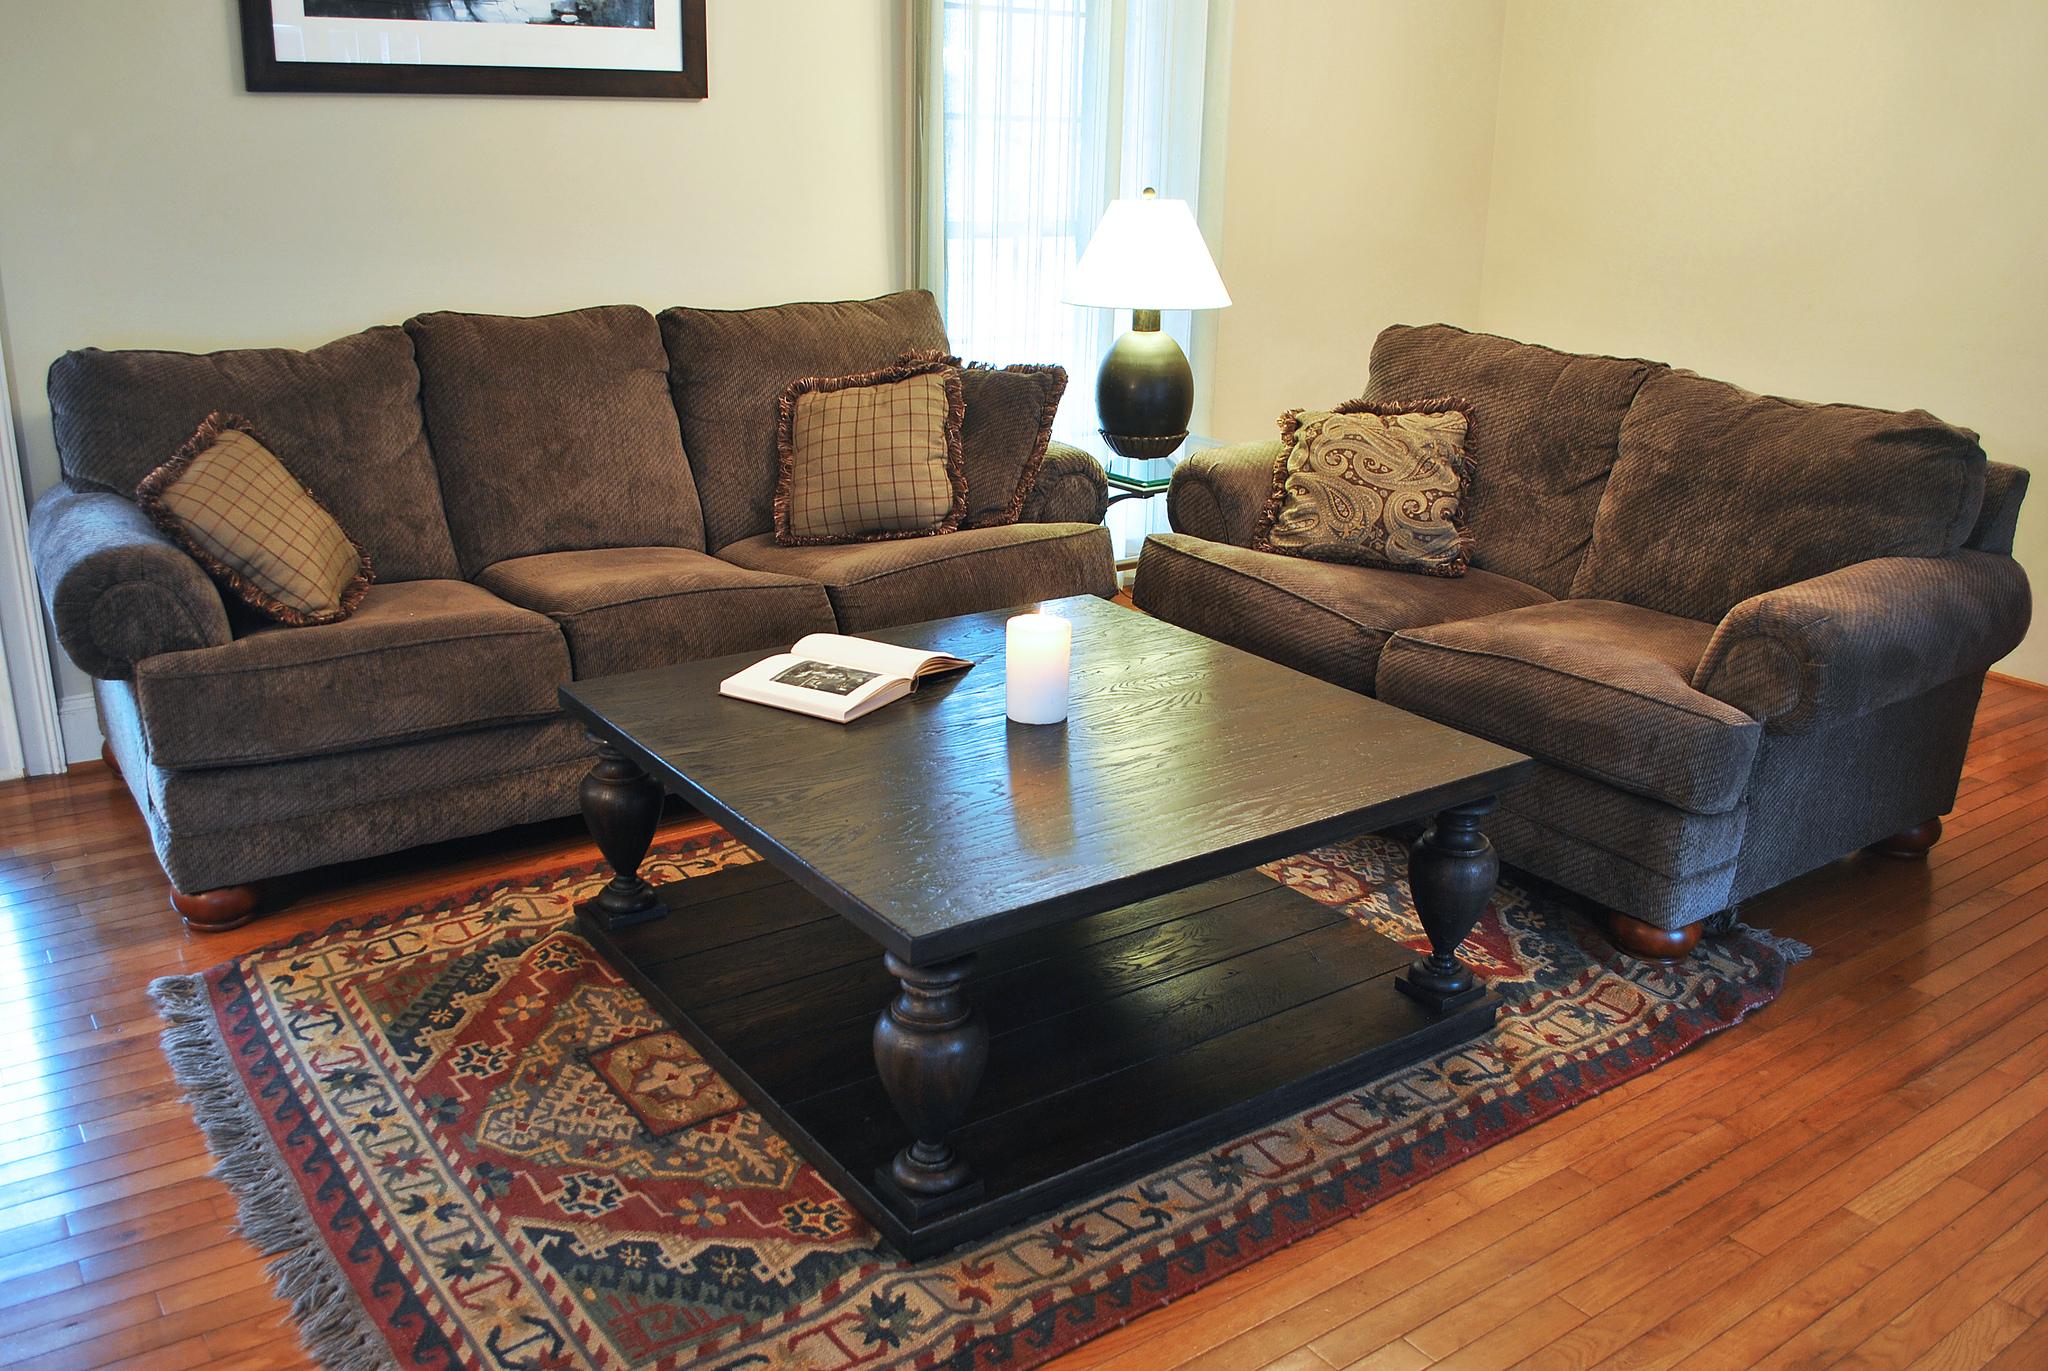 Atlanta, GA Custom Coffee Tables Traditional, Mid-Modern